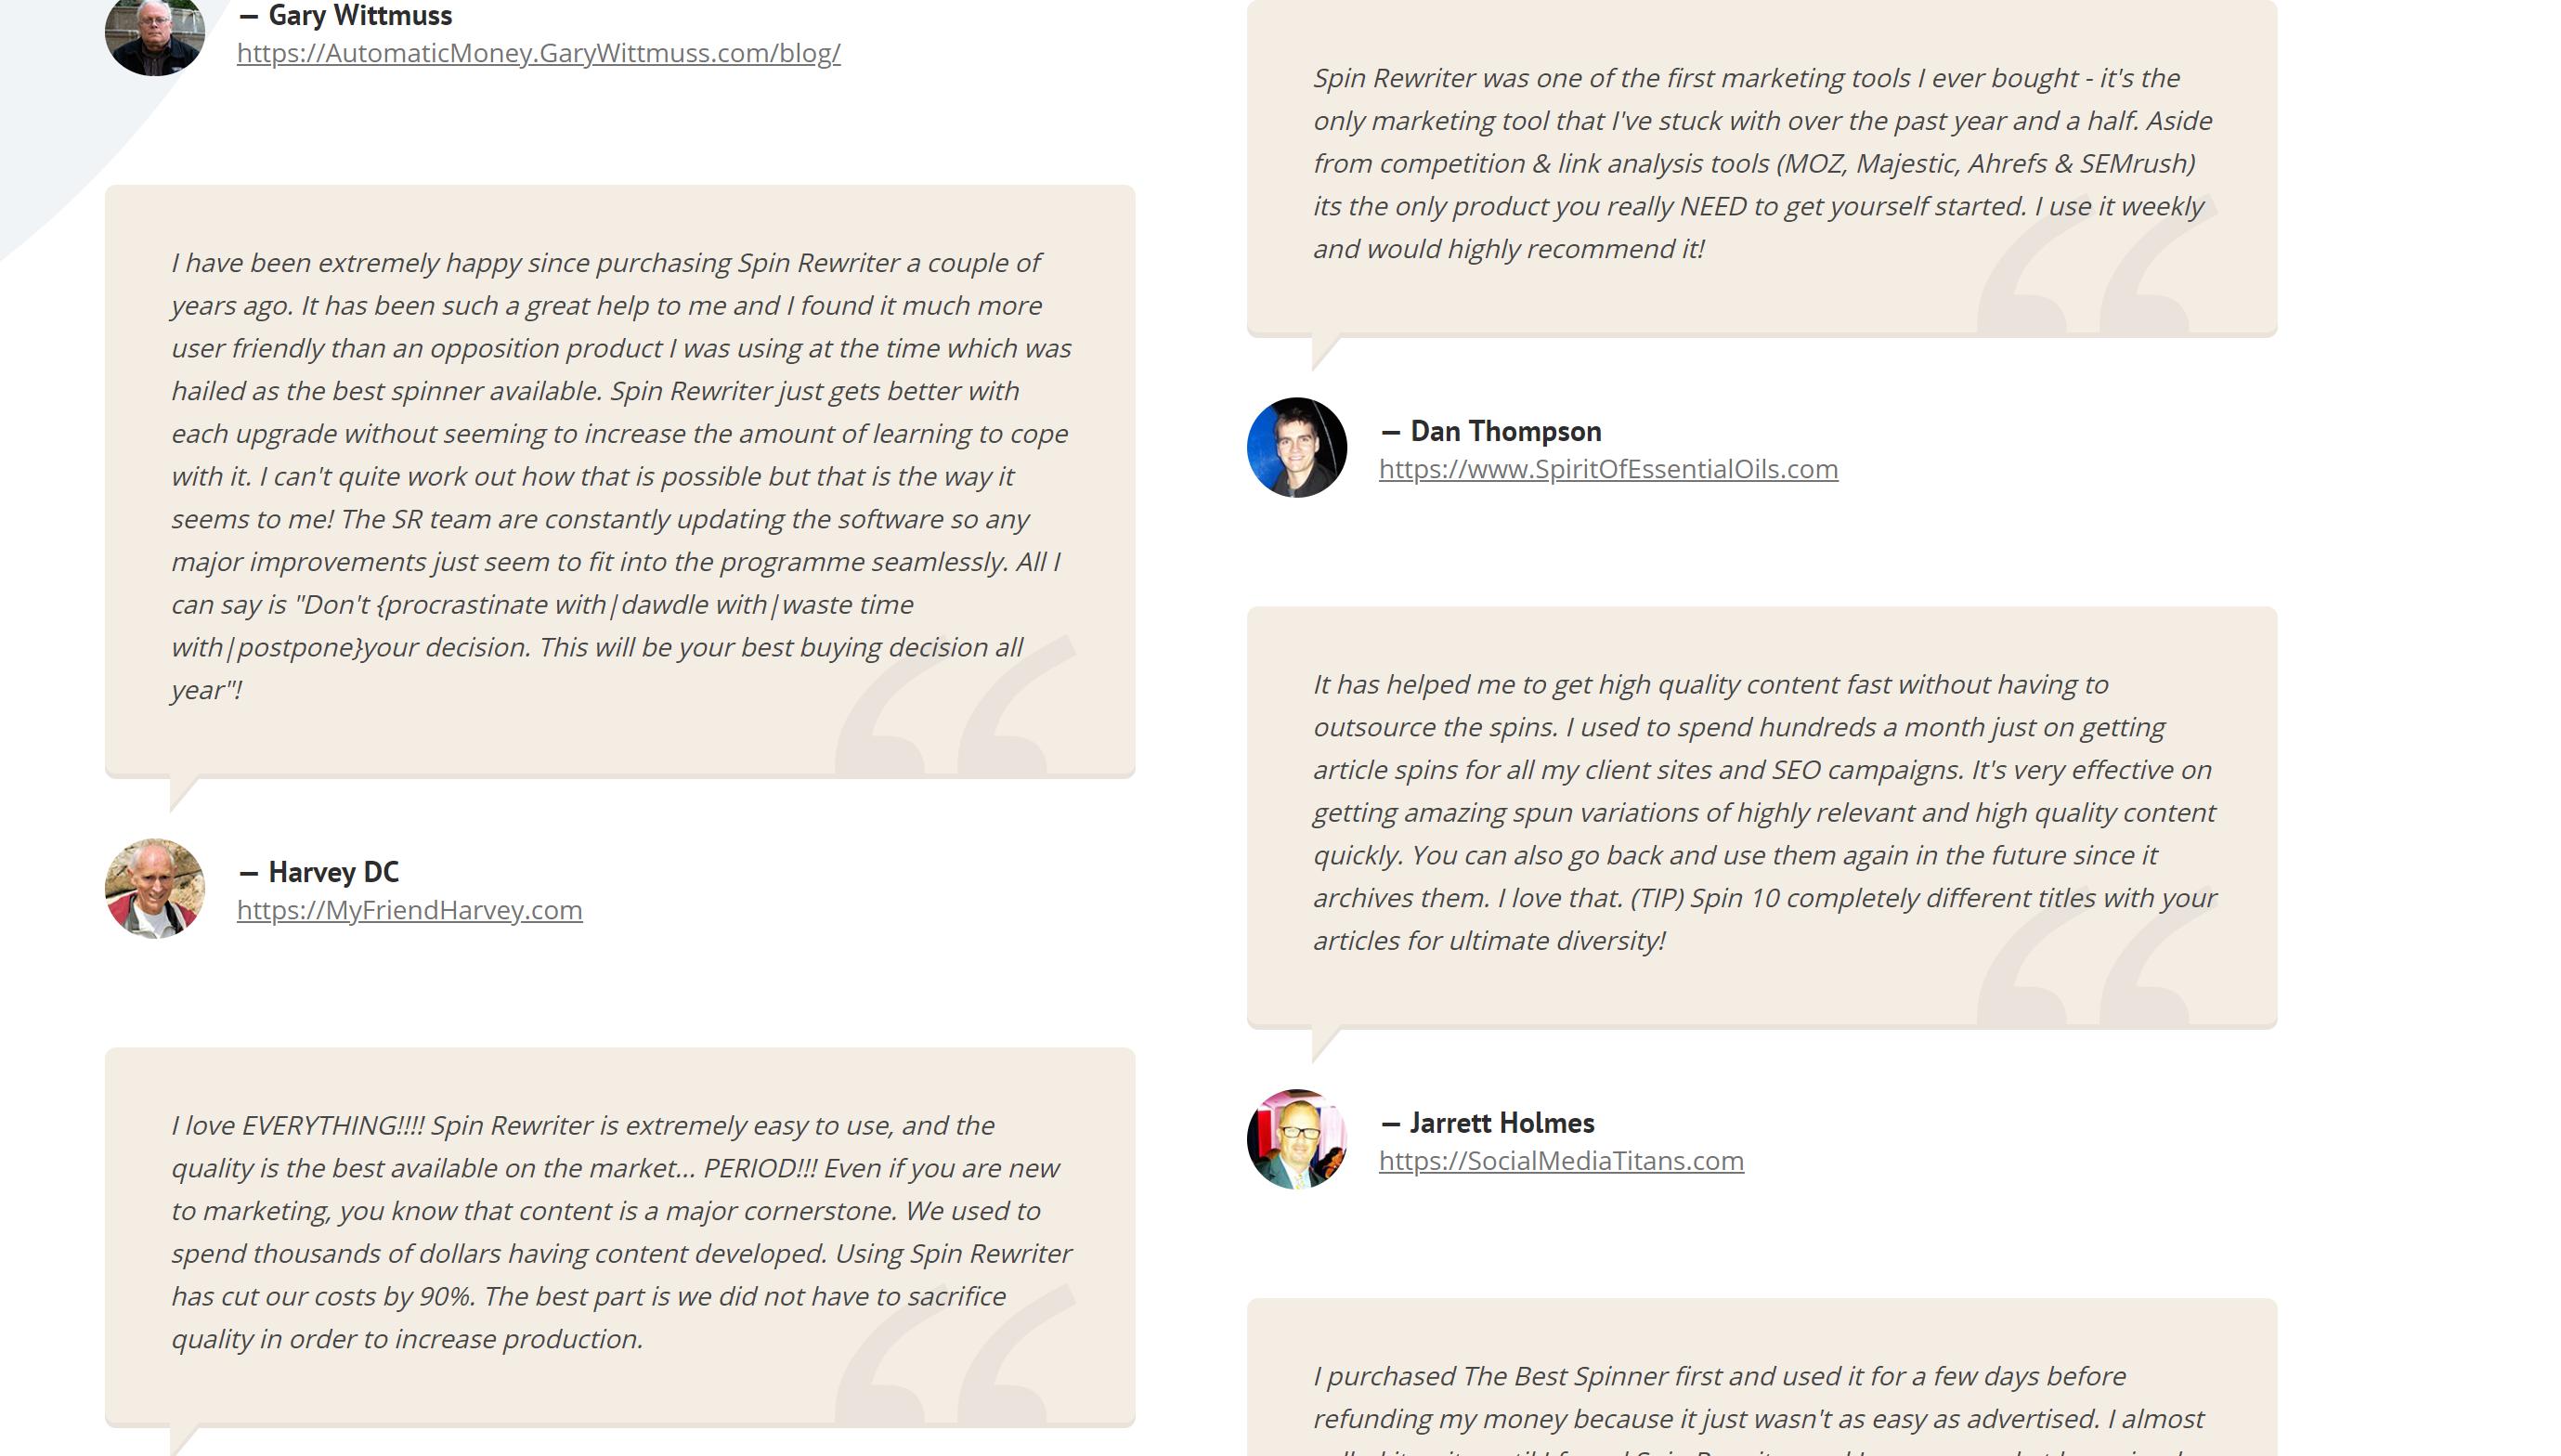 Spin rewriter reviews online